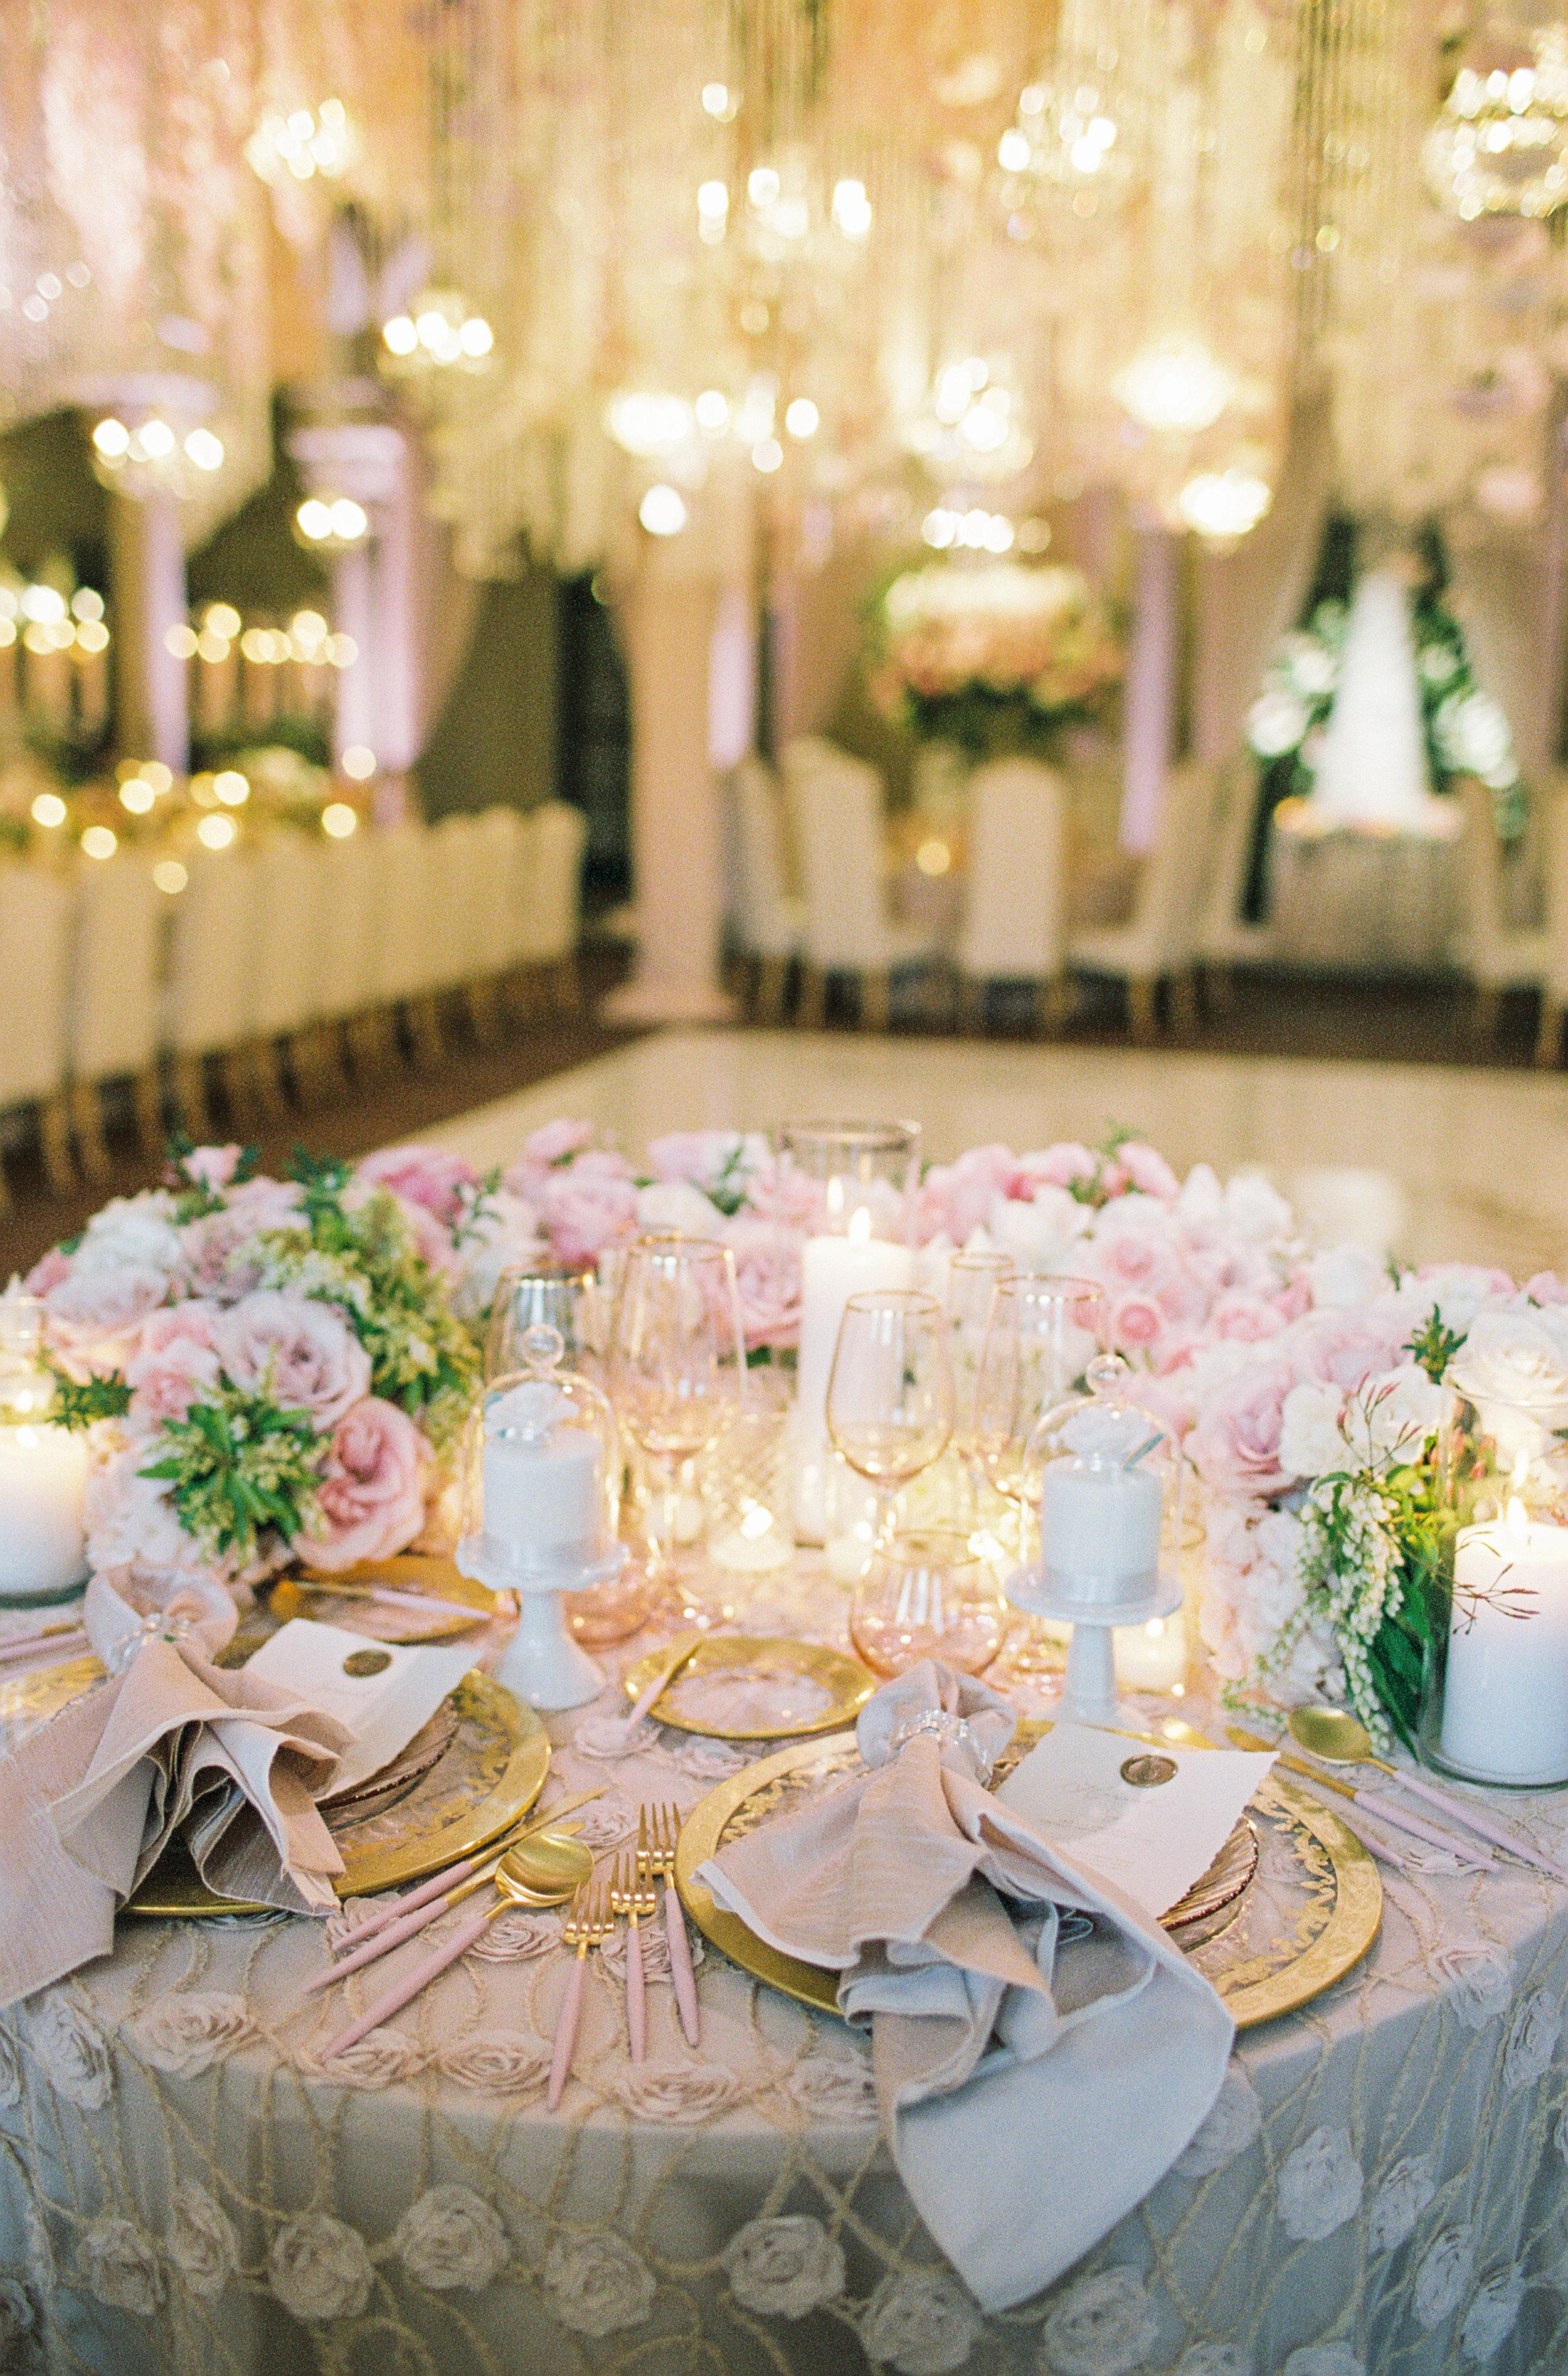 Athenaeum_Wedding_Hi_Res-87-Jen_Huang-005180-R1-005.jpg